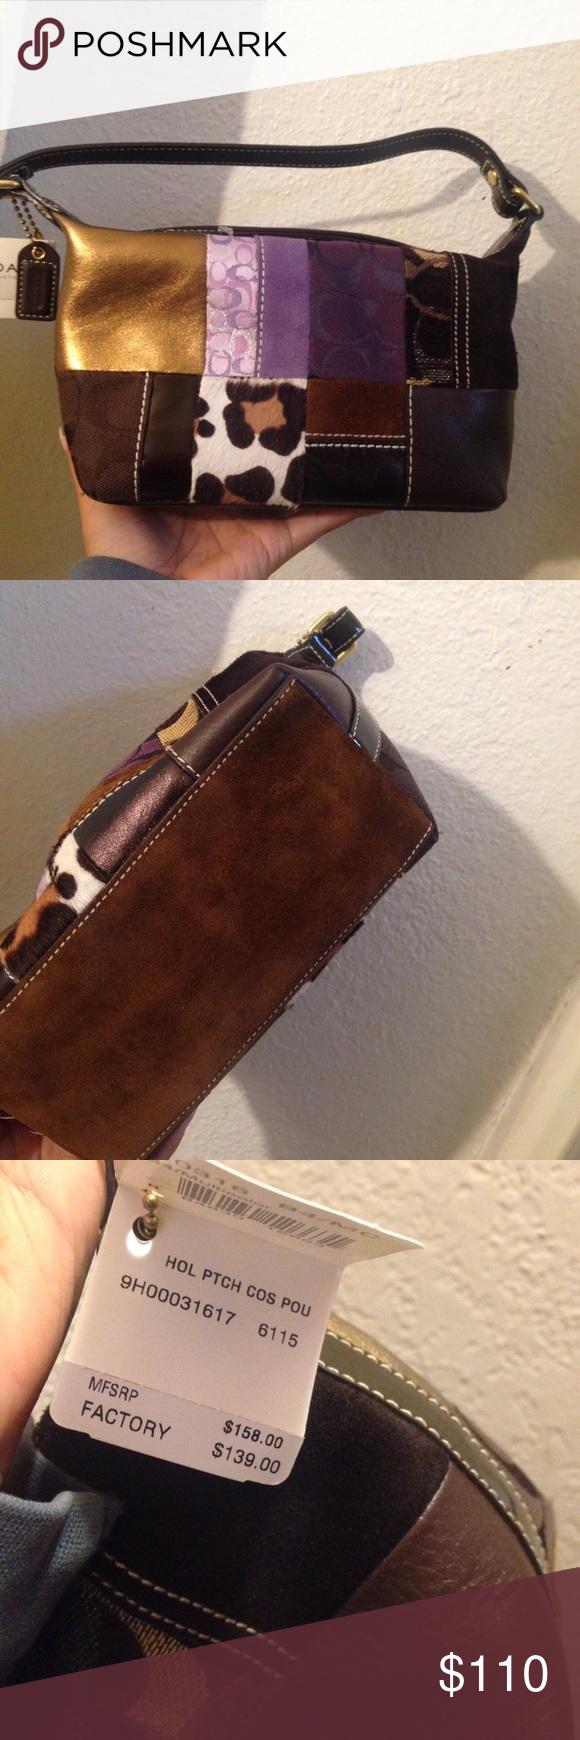 Spotted while shopping on Poshmark  Make offer NWT vintage bag!  poshmark   fashion  shopping  style  Coach  Handbags f217c62f1d